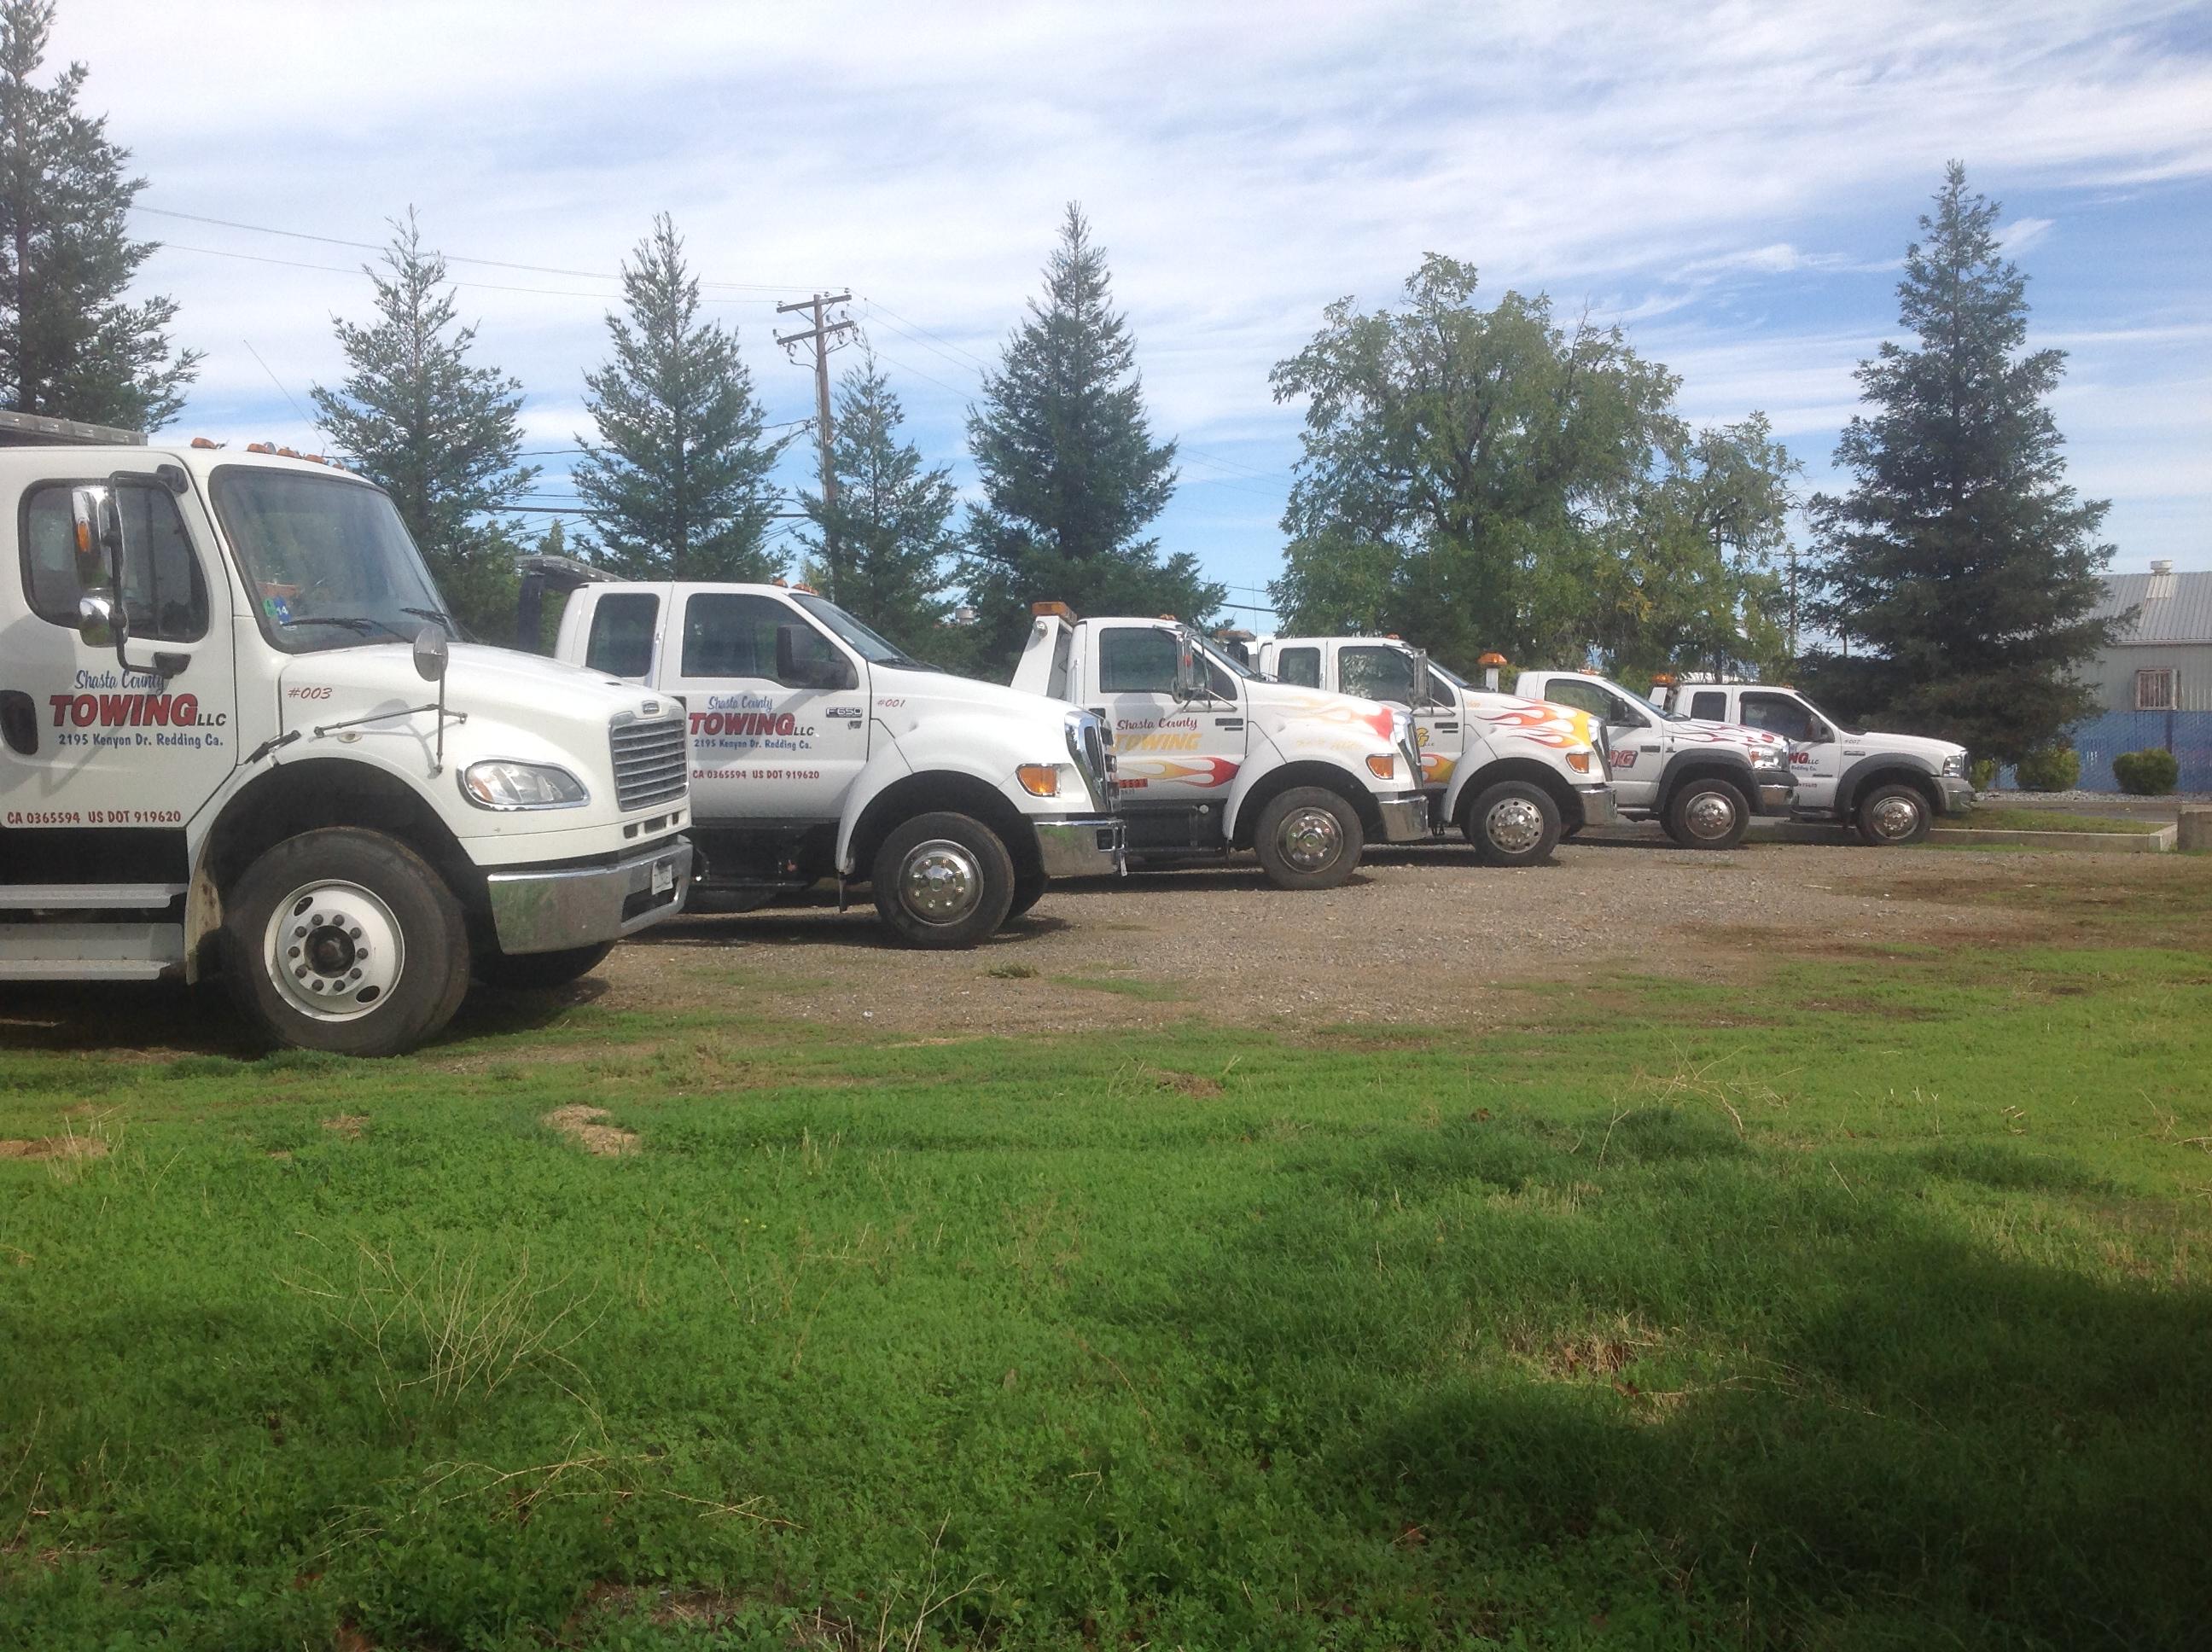 Shasta county towing llc at 2195 kenyon dr redding ca on for Shasta motors redding california